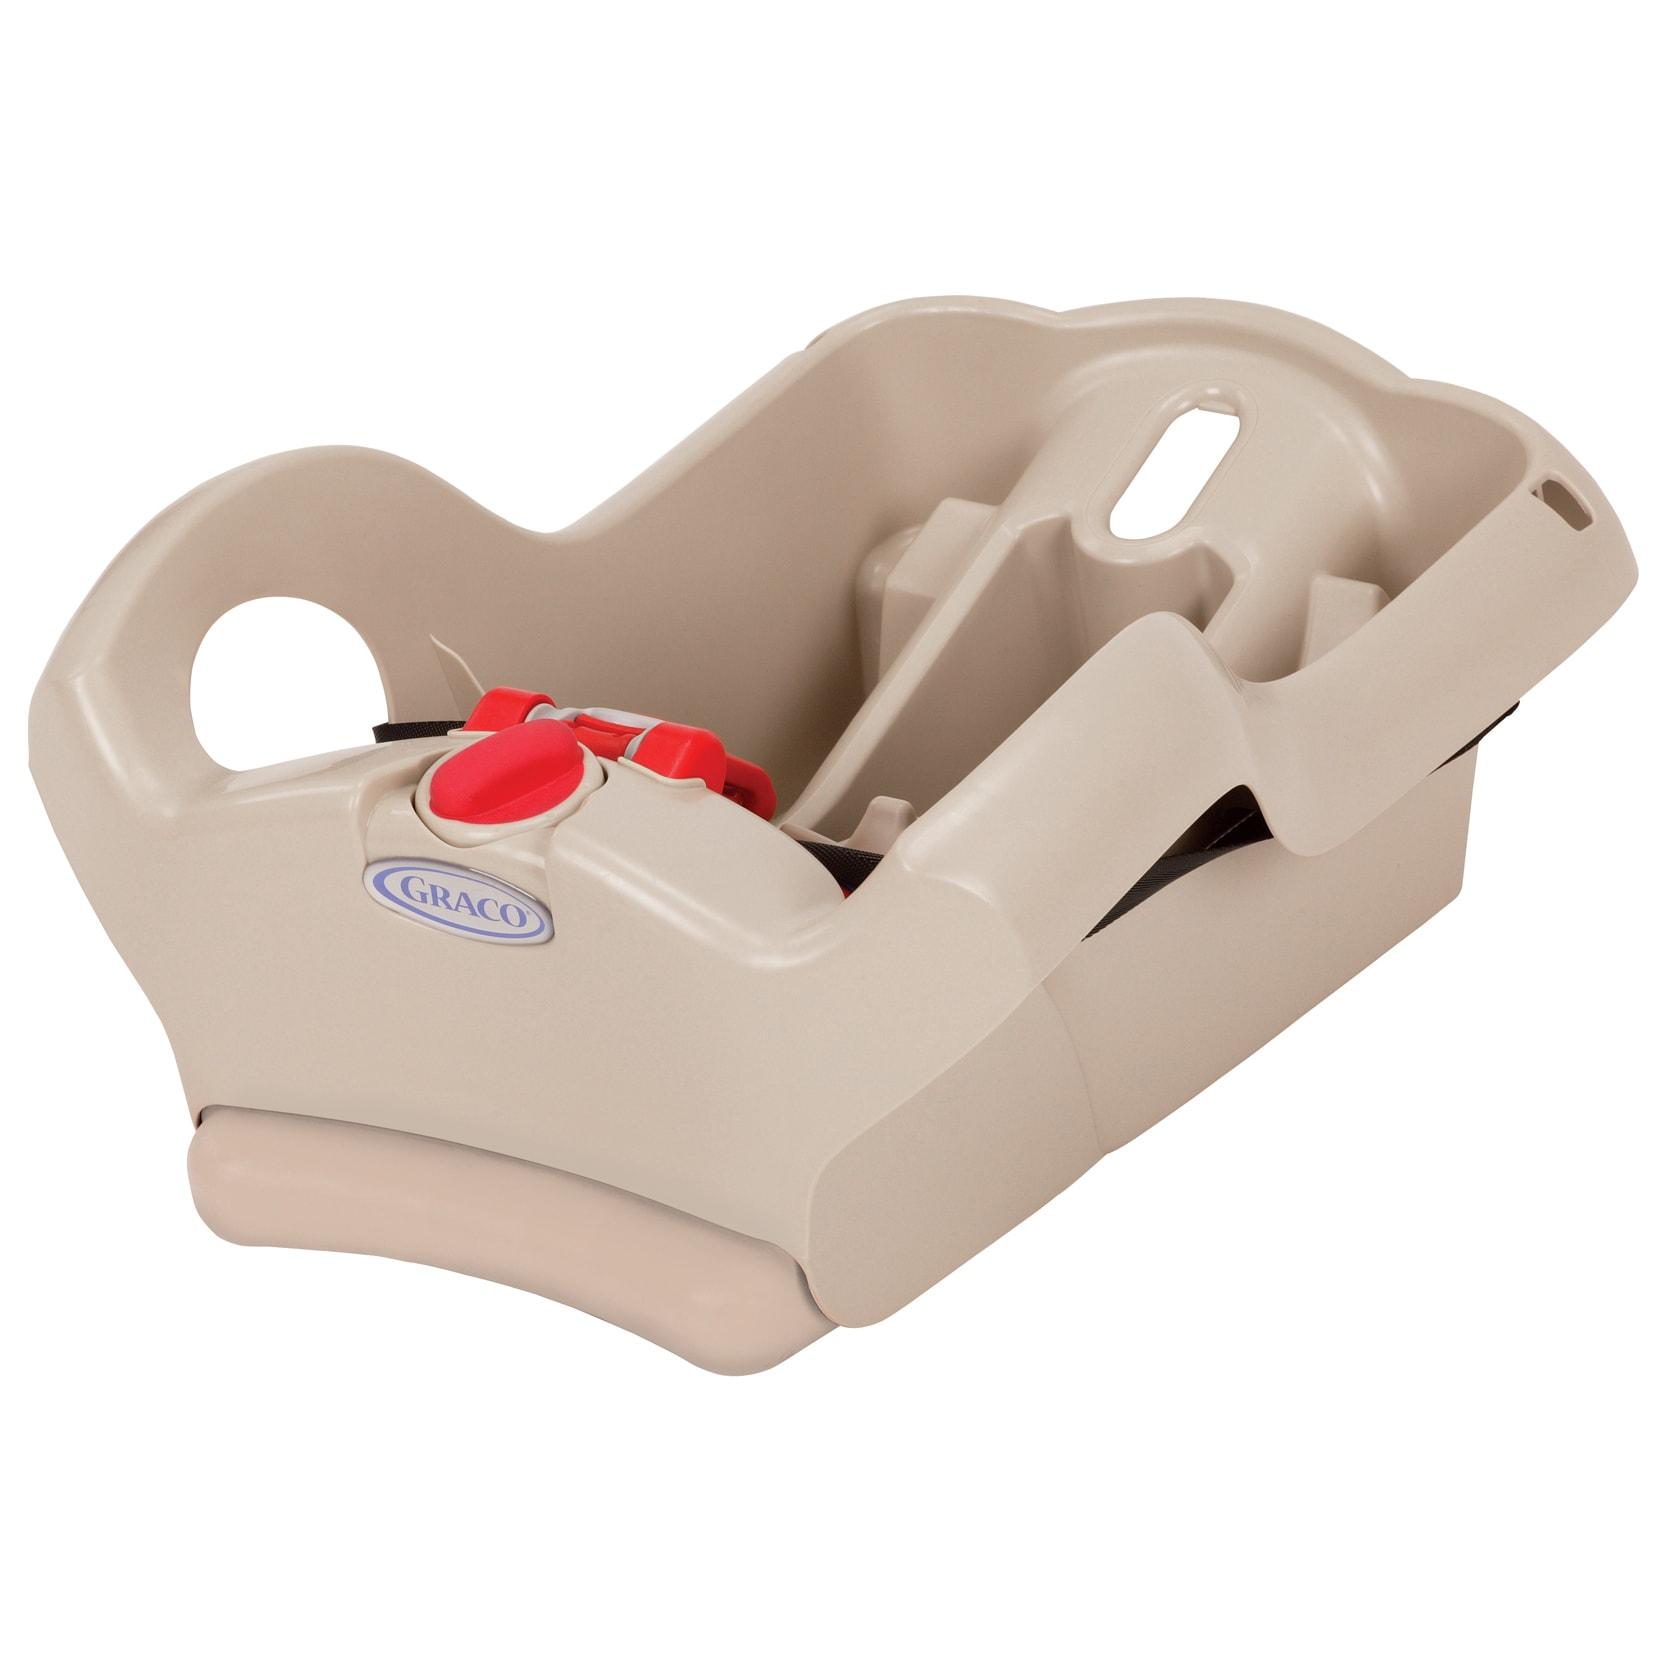 graco snugride 30 35 infant car seat base 14150809 shopping big discounts on. Black Bedroom Furniture Sets. Home Design Ideas